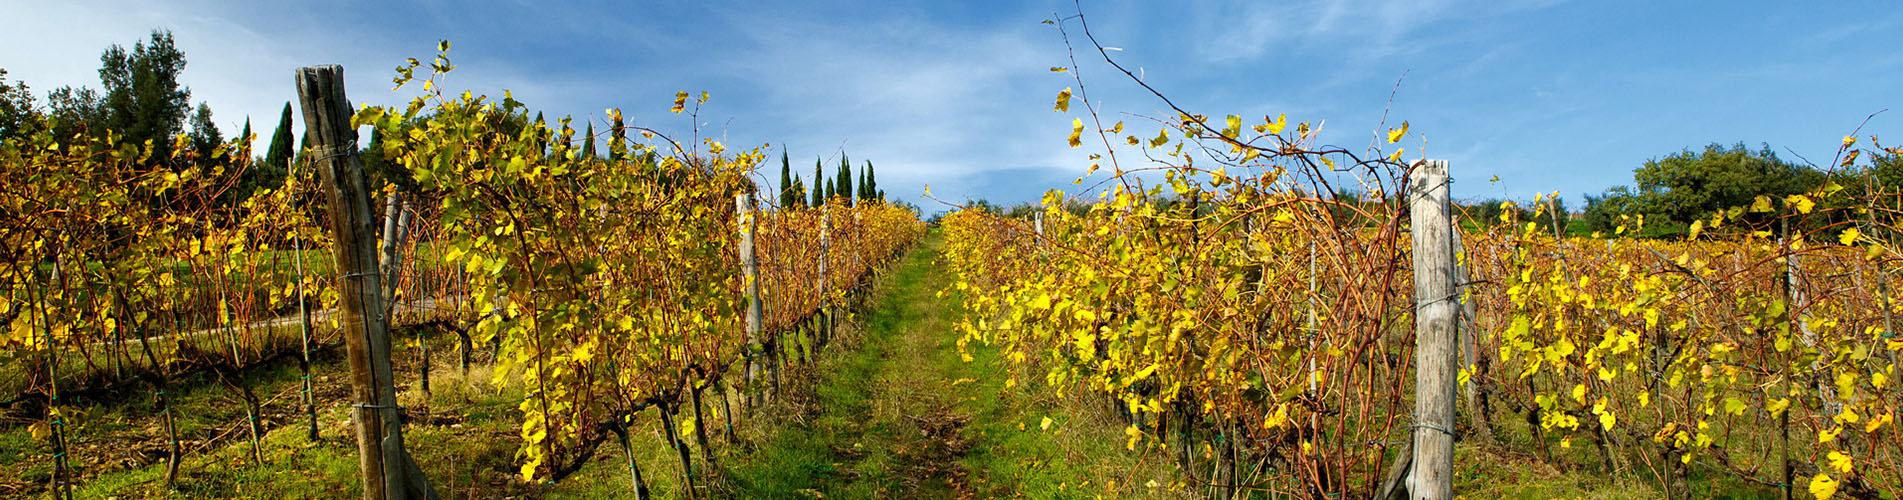 tuscany_slide3